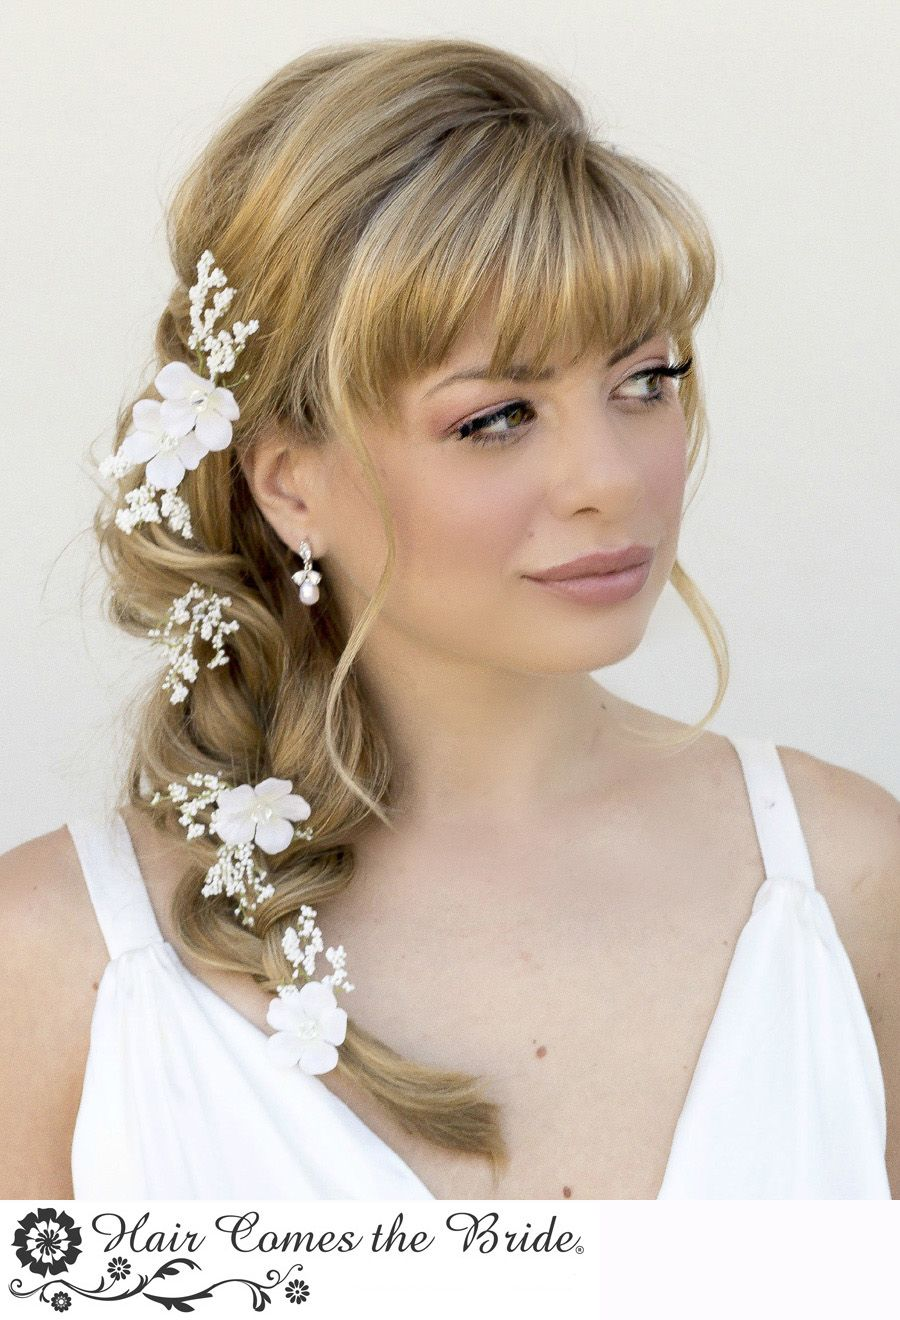 pin by cara orokos on beauty | bridal braids, wedding hair